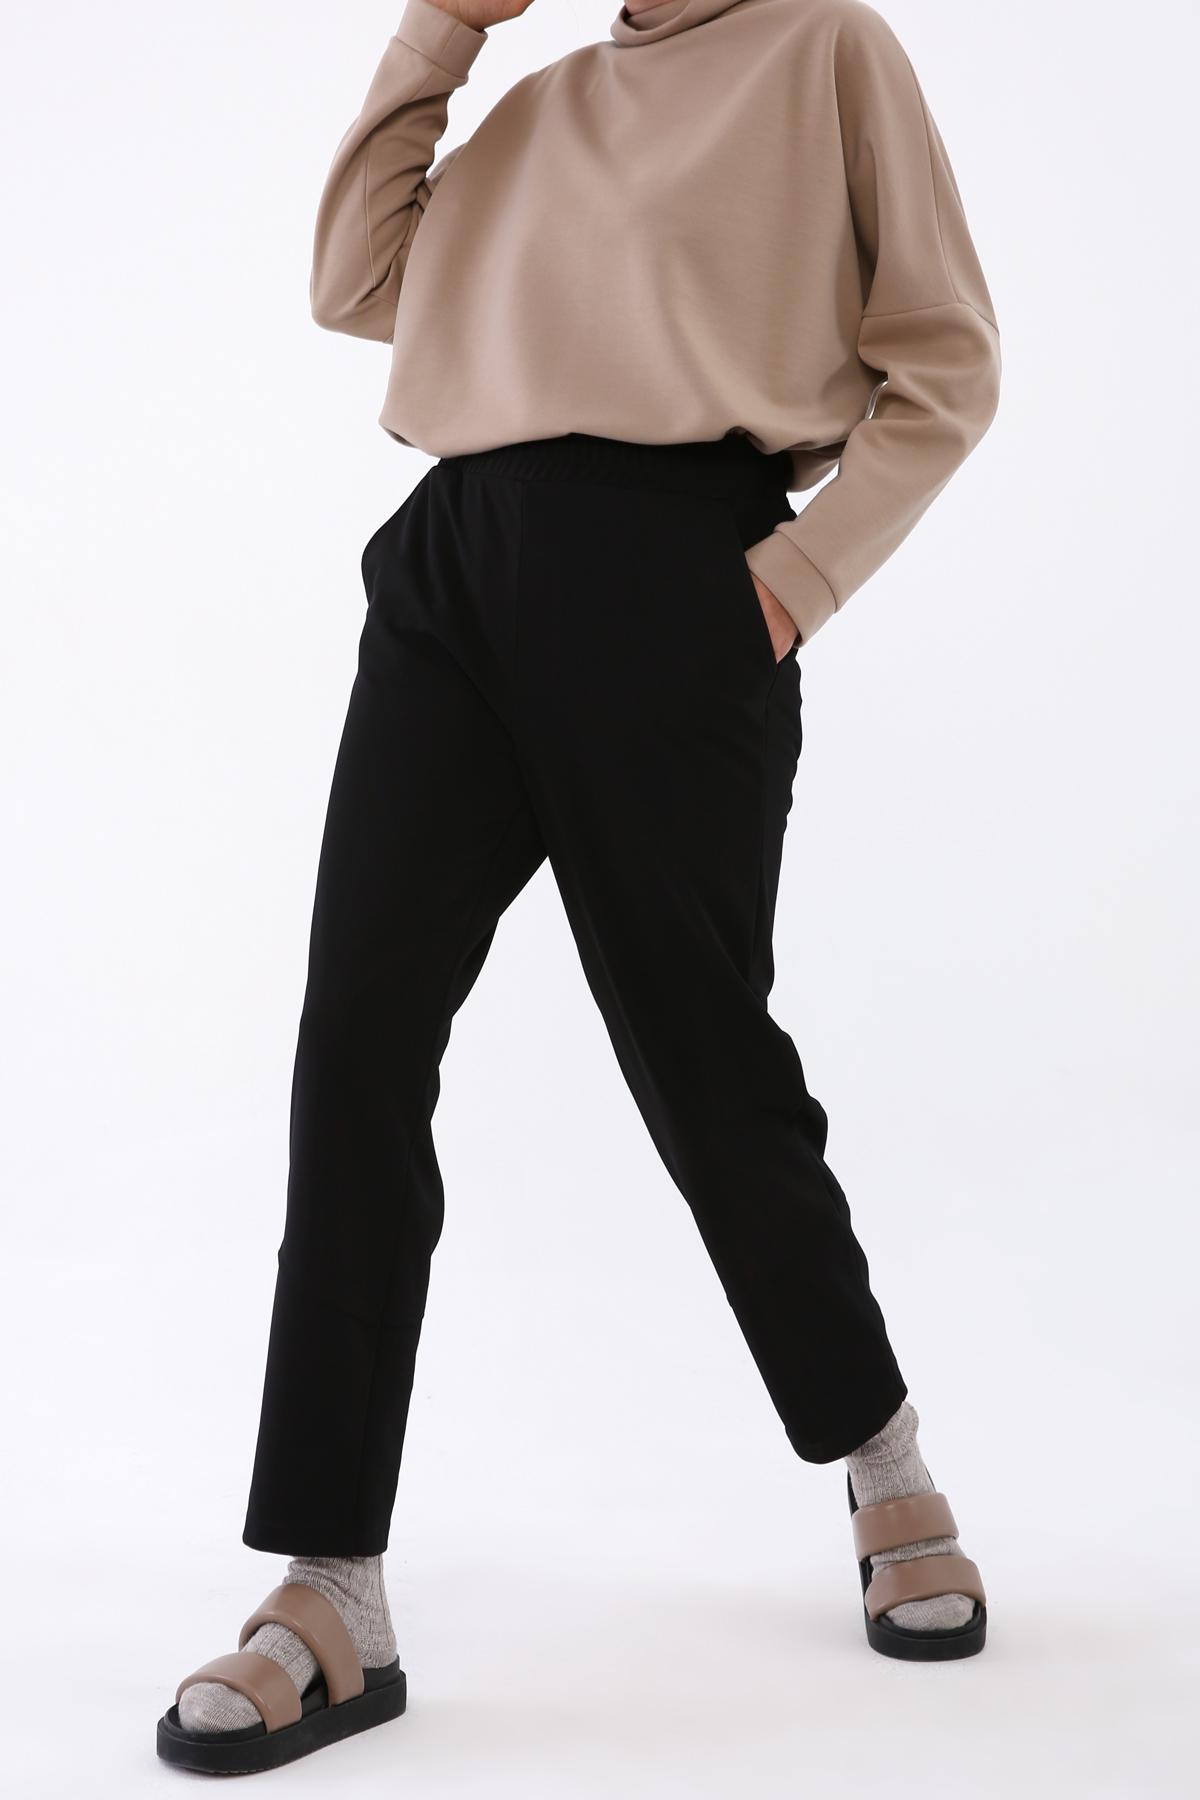 Fantezi Kumaş Örme Pantolon